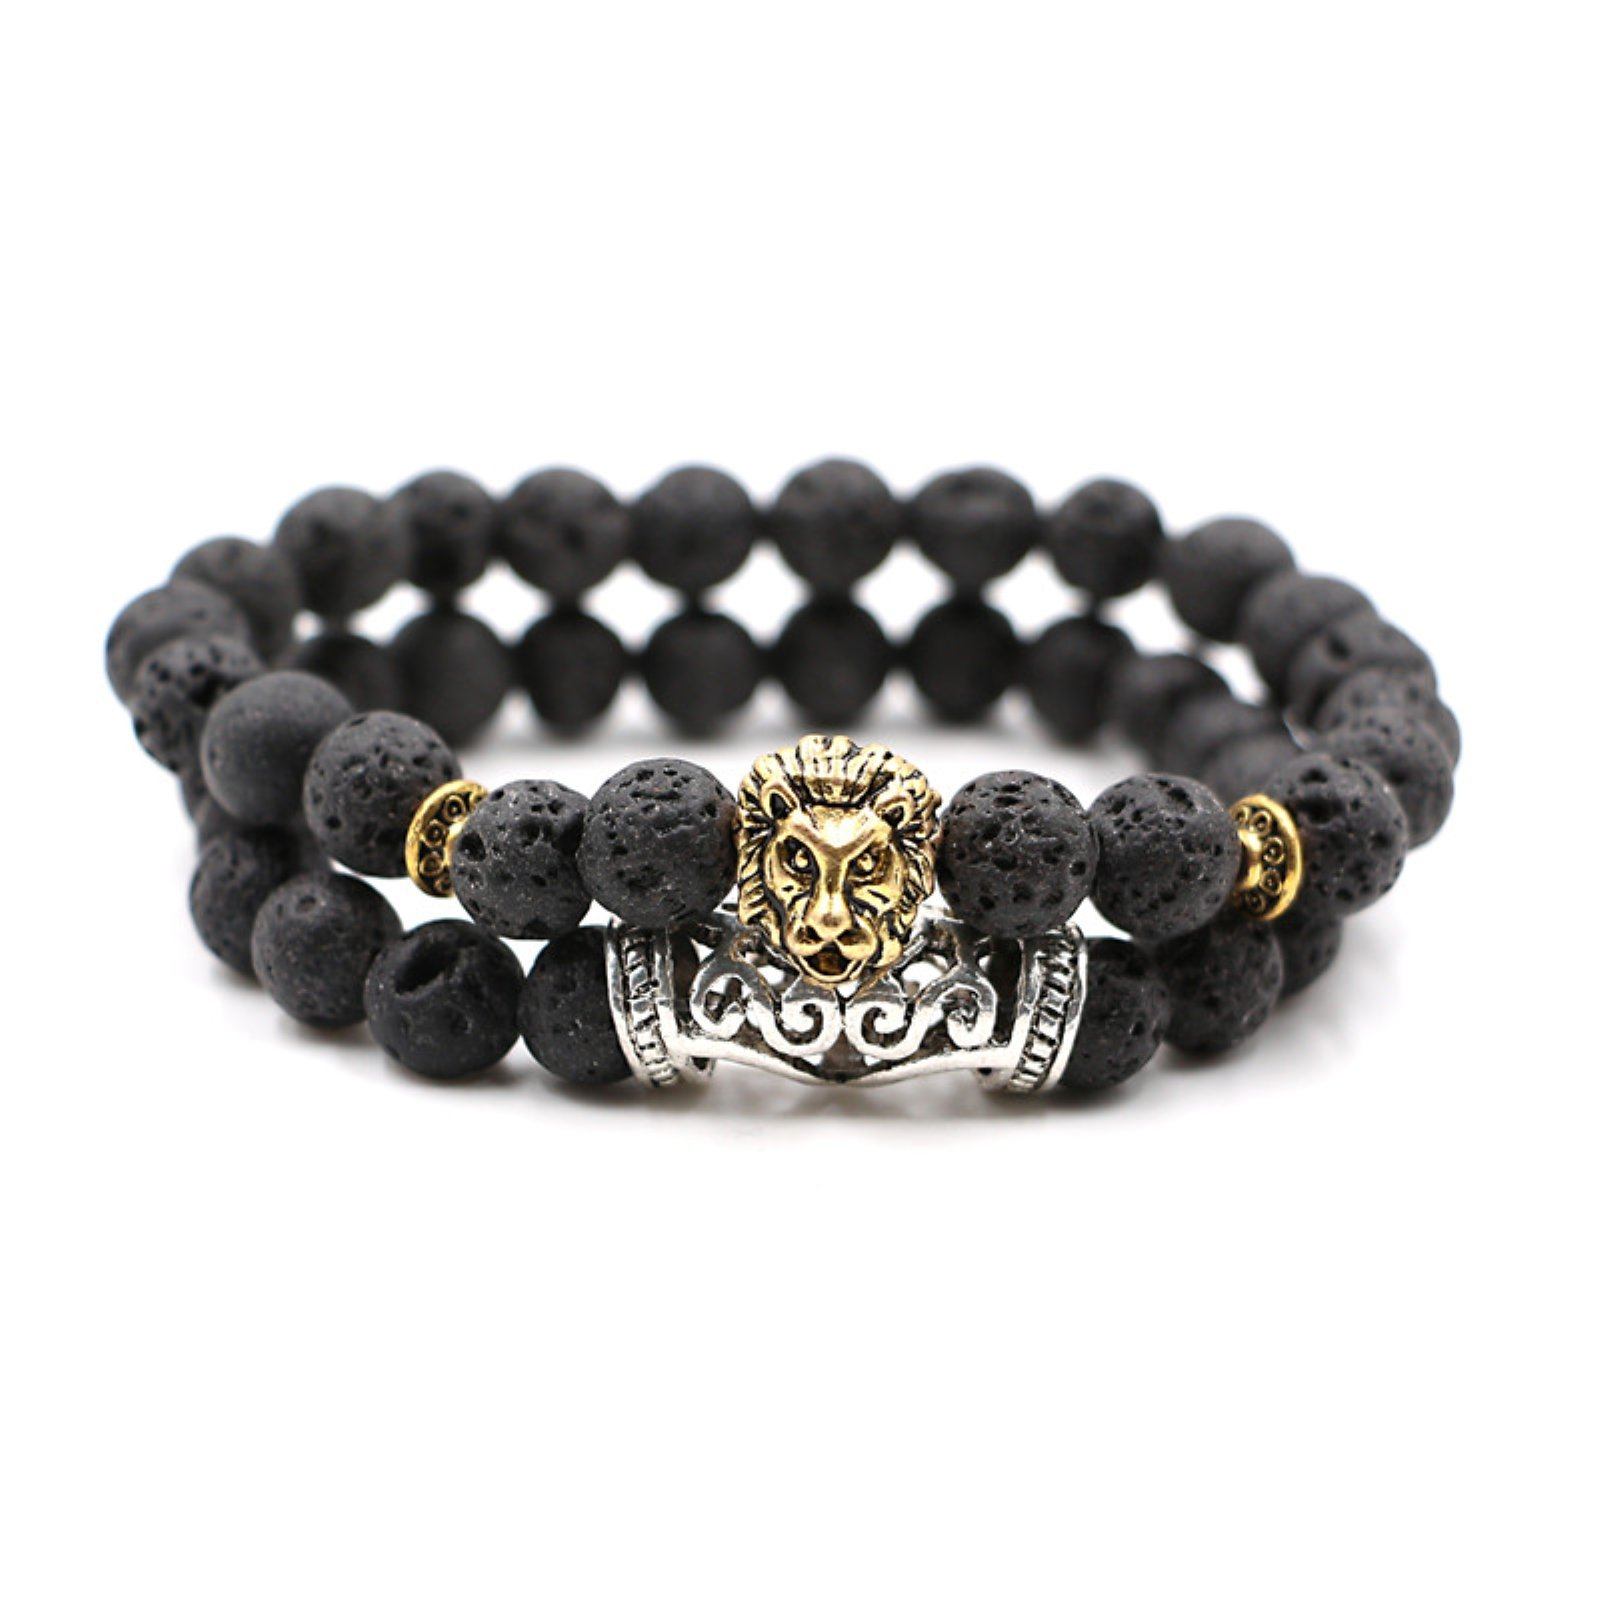 HYHONEY Hot Natural Lava Tiger Eye Stone Beads Bracelet For Men Antique Gold Lion Head Bracelet